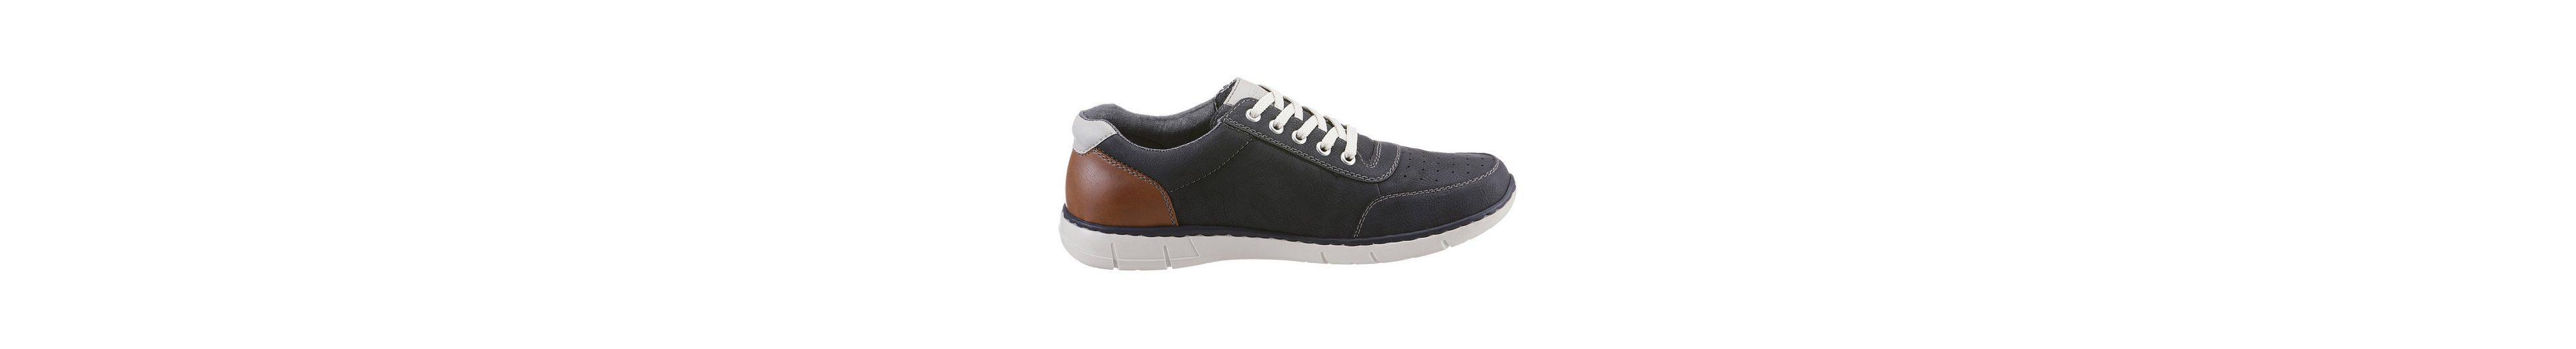 Rieker Derby/Kid Sneaker, im leichten Used Look